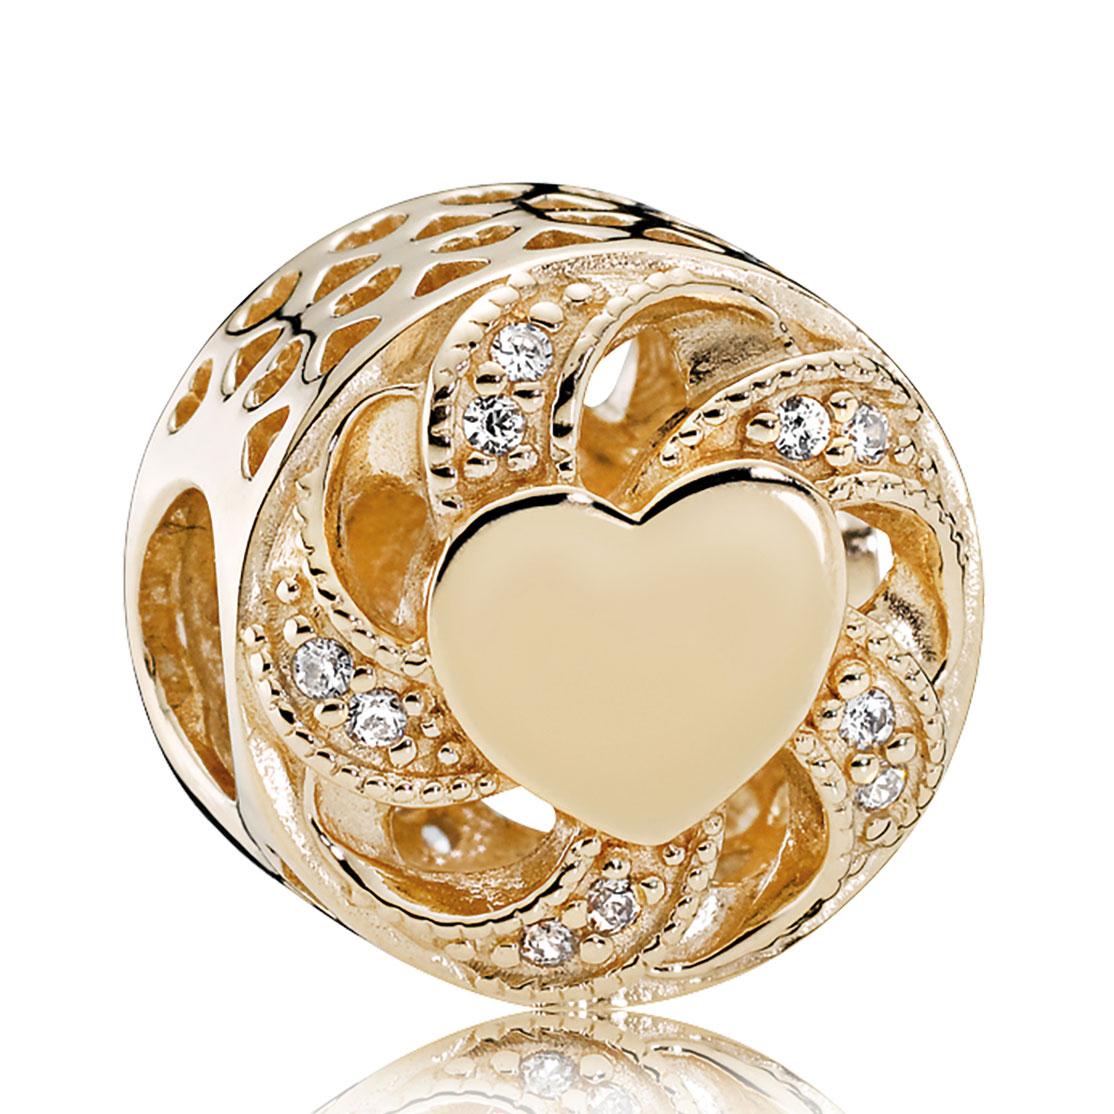 0ec7e171a PANDORA 14KT Gold Charms - Pancharmbracelets.com